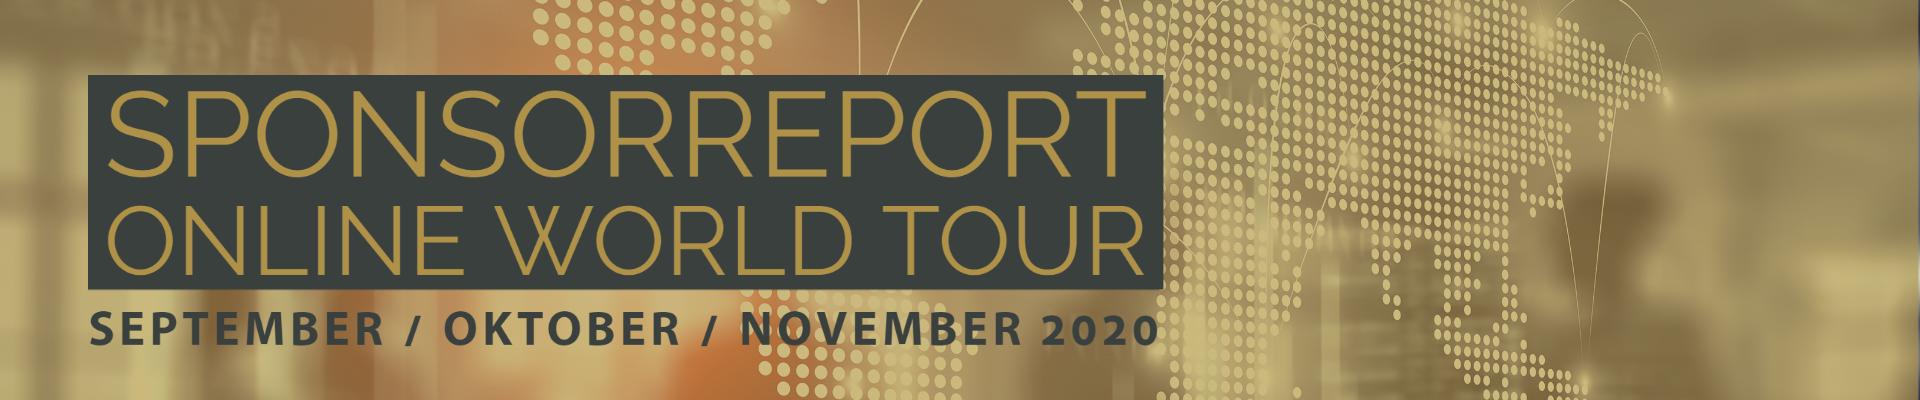 Sponsorreport Online World Tour